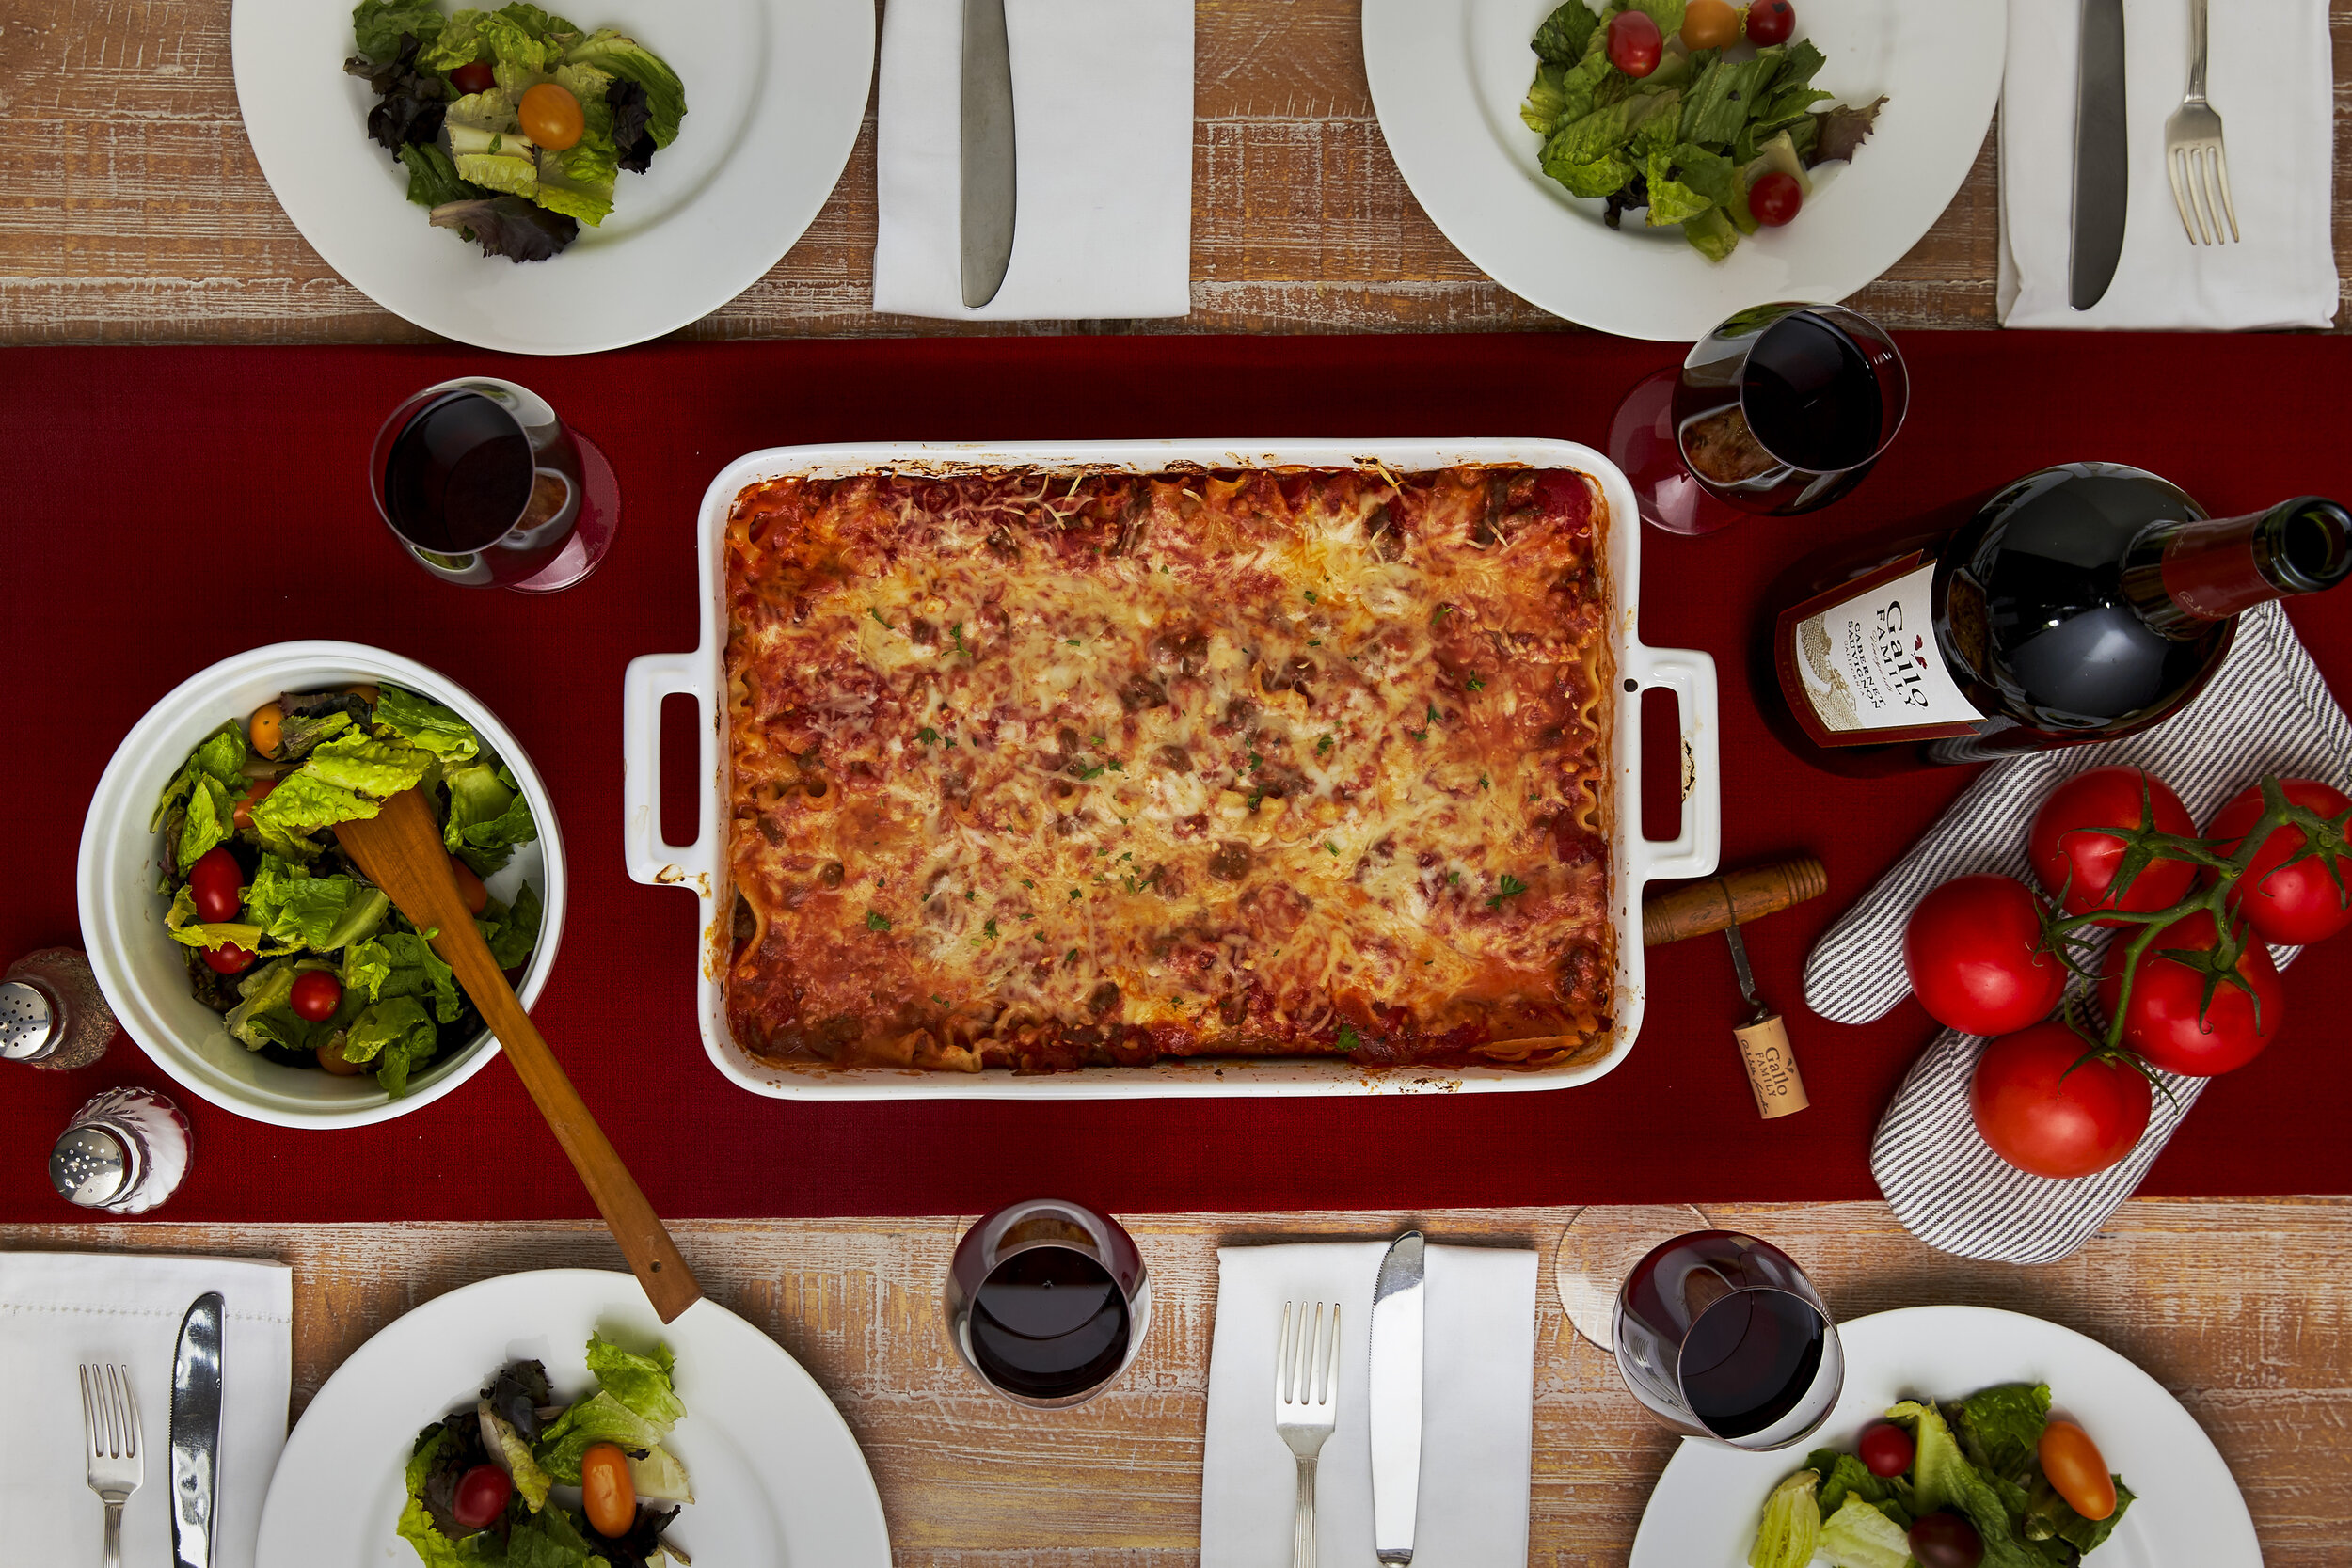 Brand: Gallo Family Vineyards